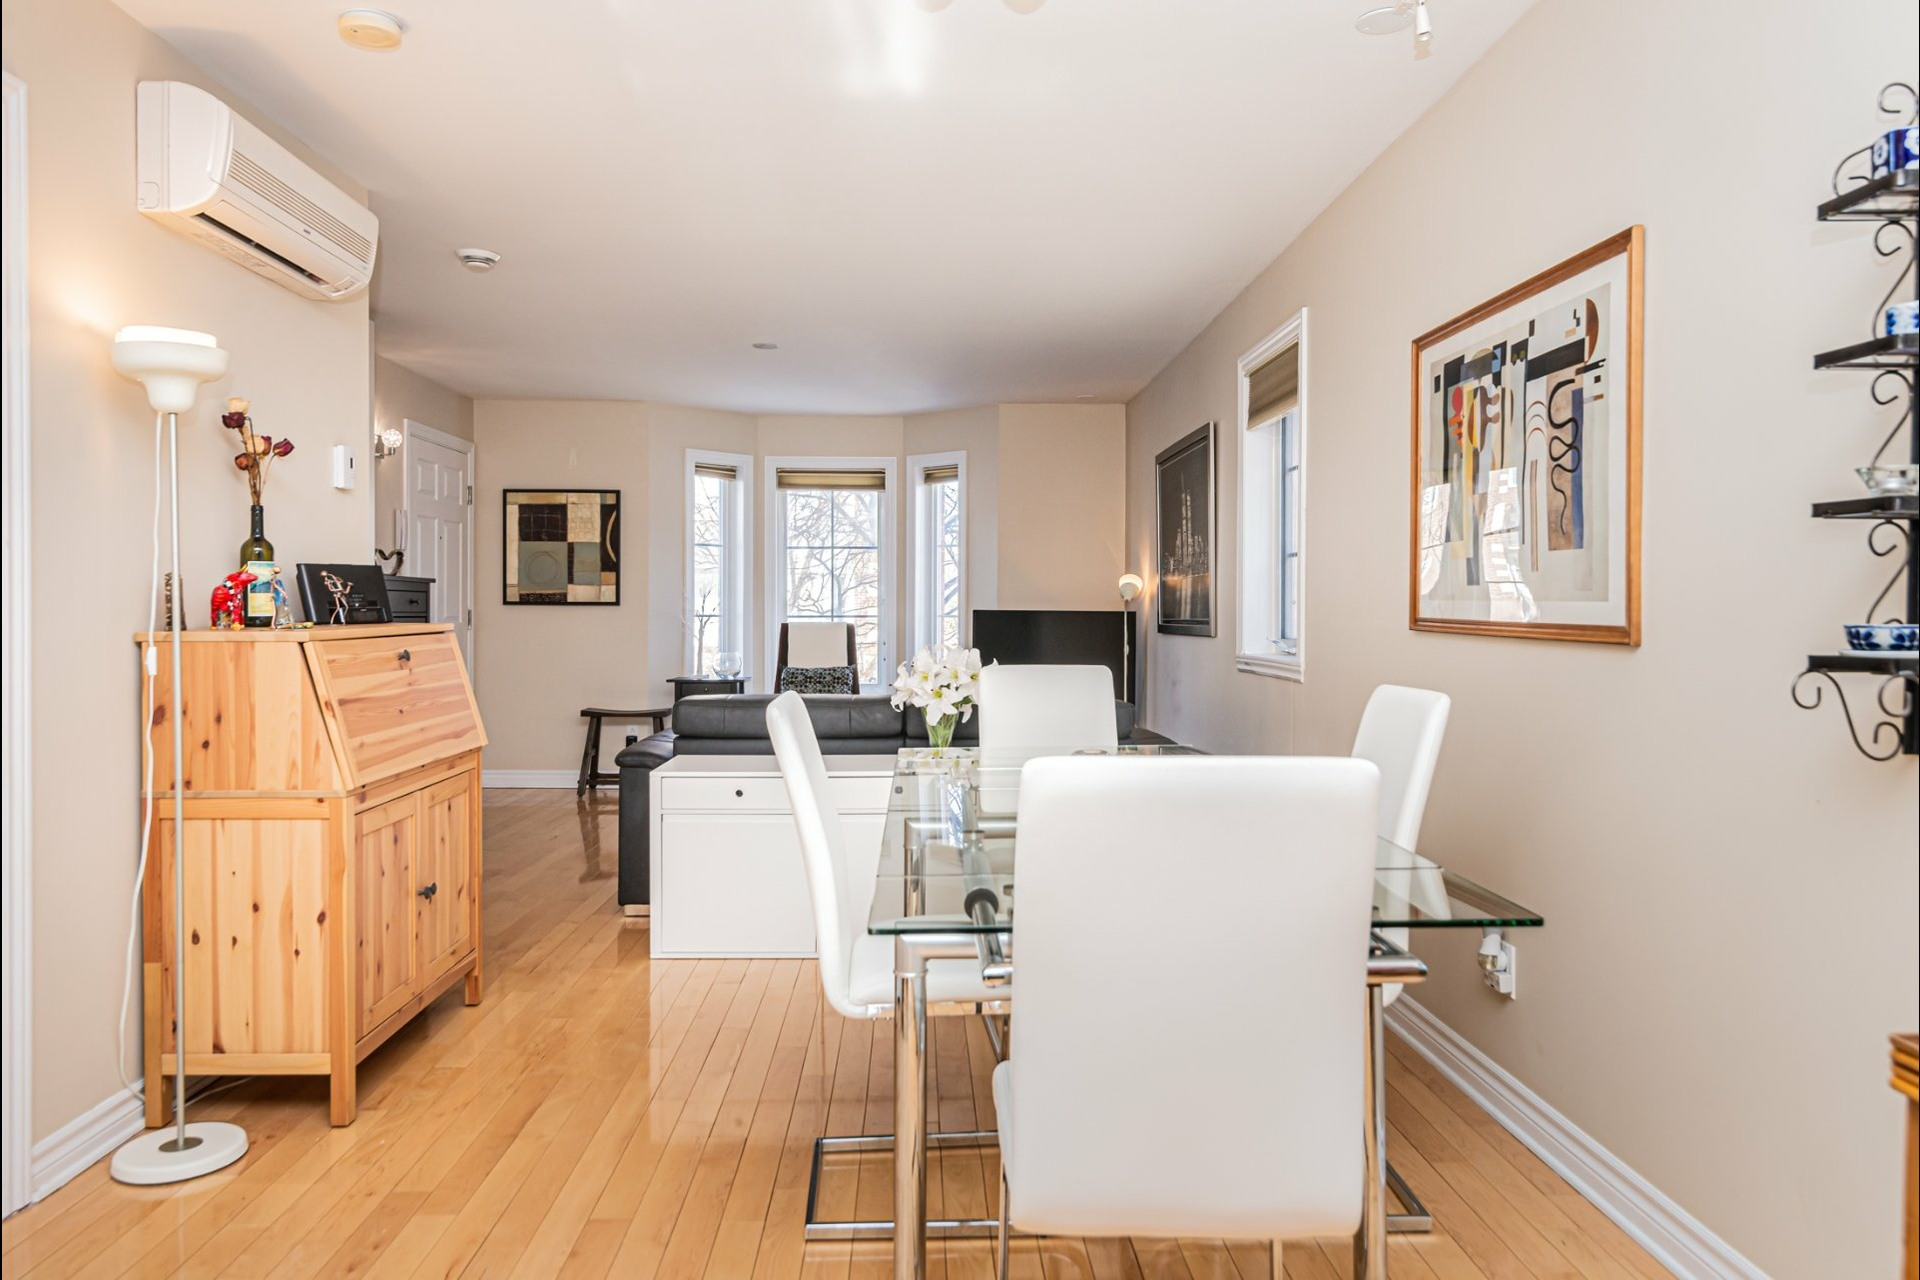 image 5 - Departamento En venta Saint-Laurent Montréal  - 4 habitaciones